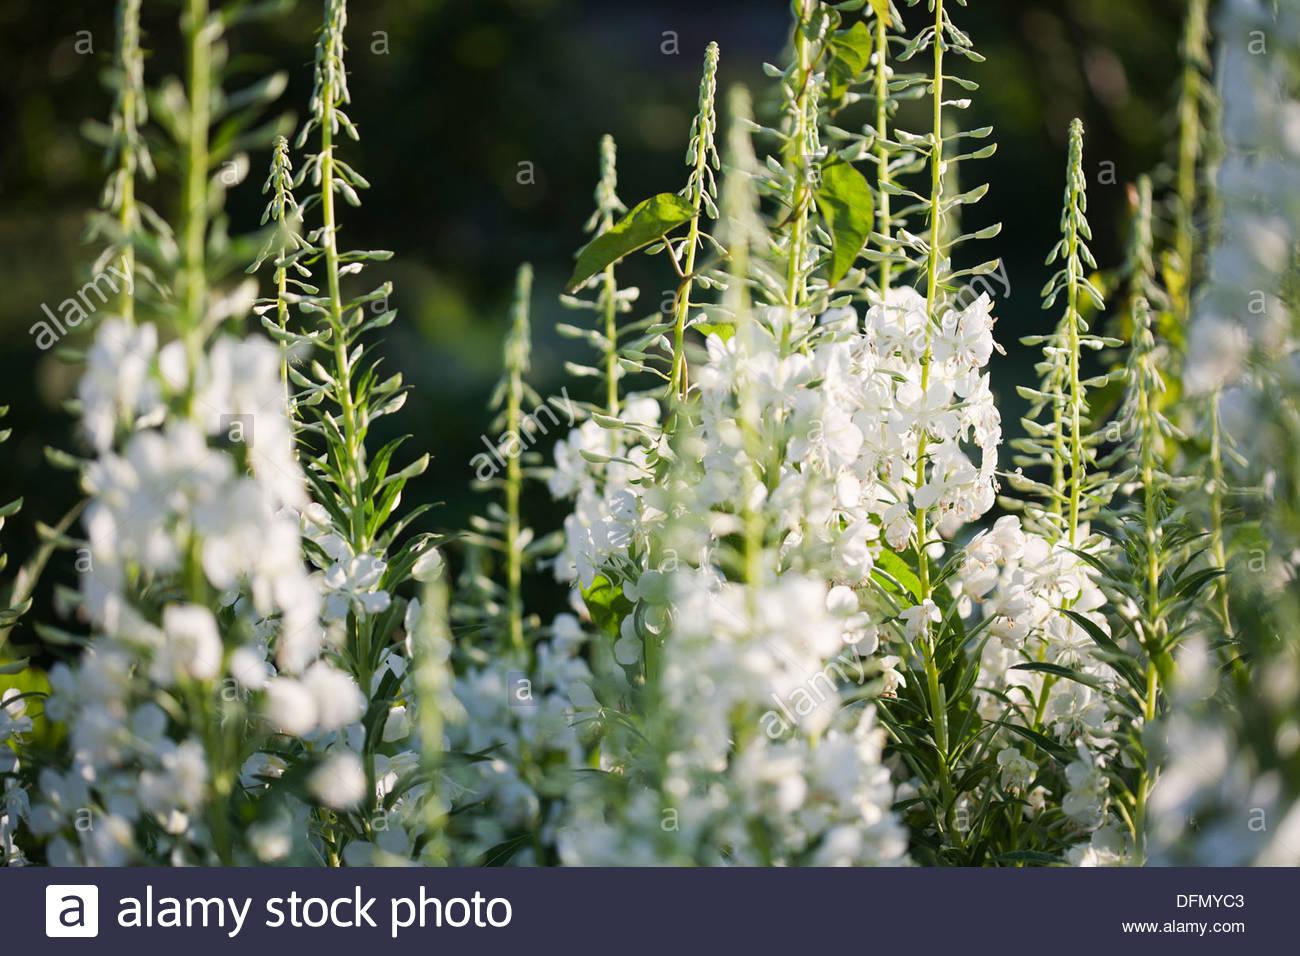 White willow herb